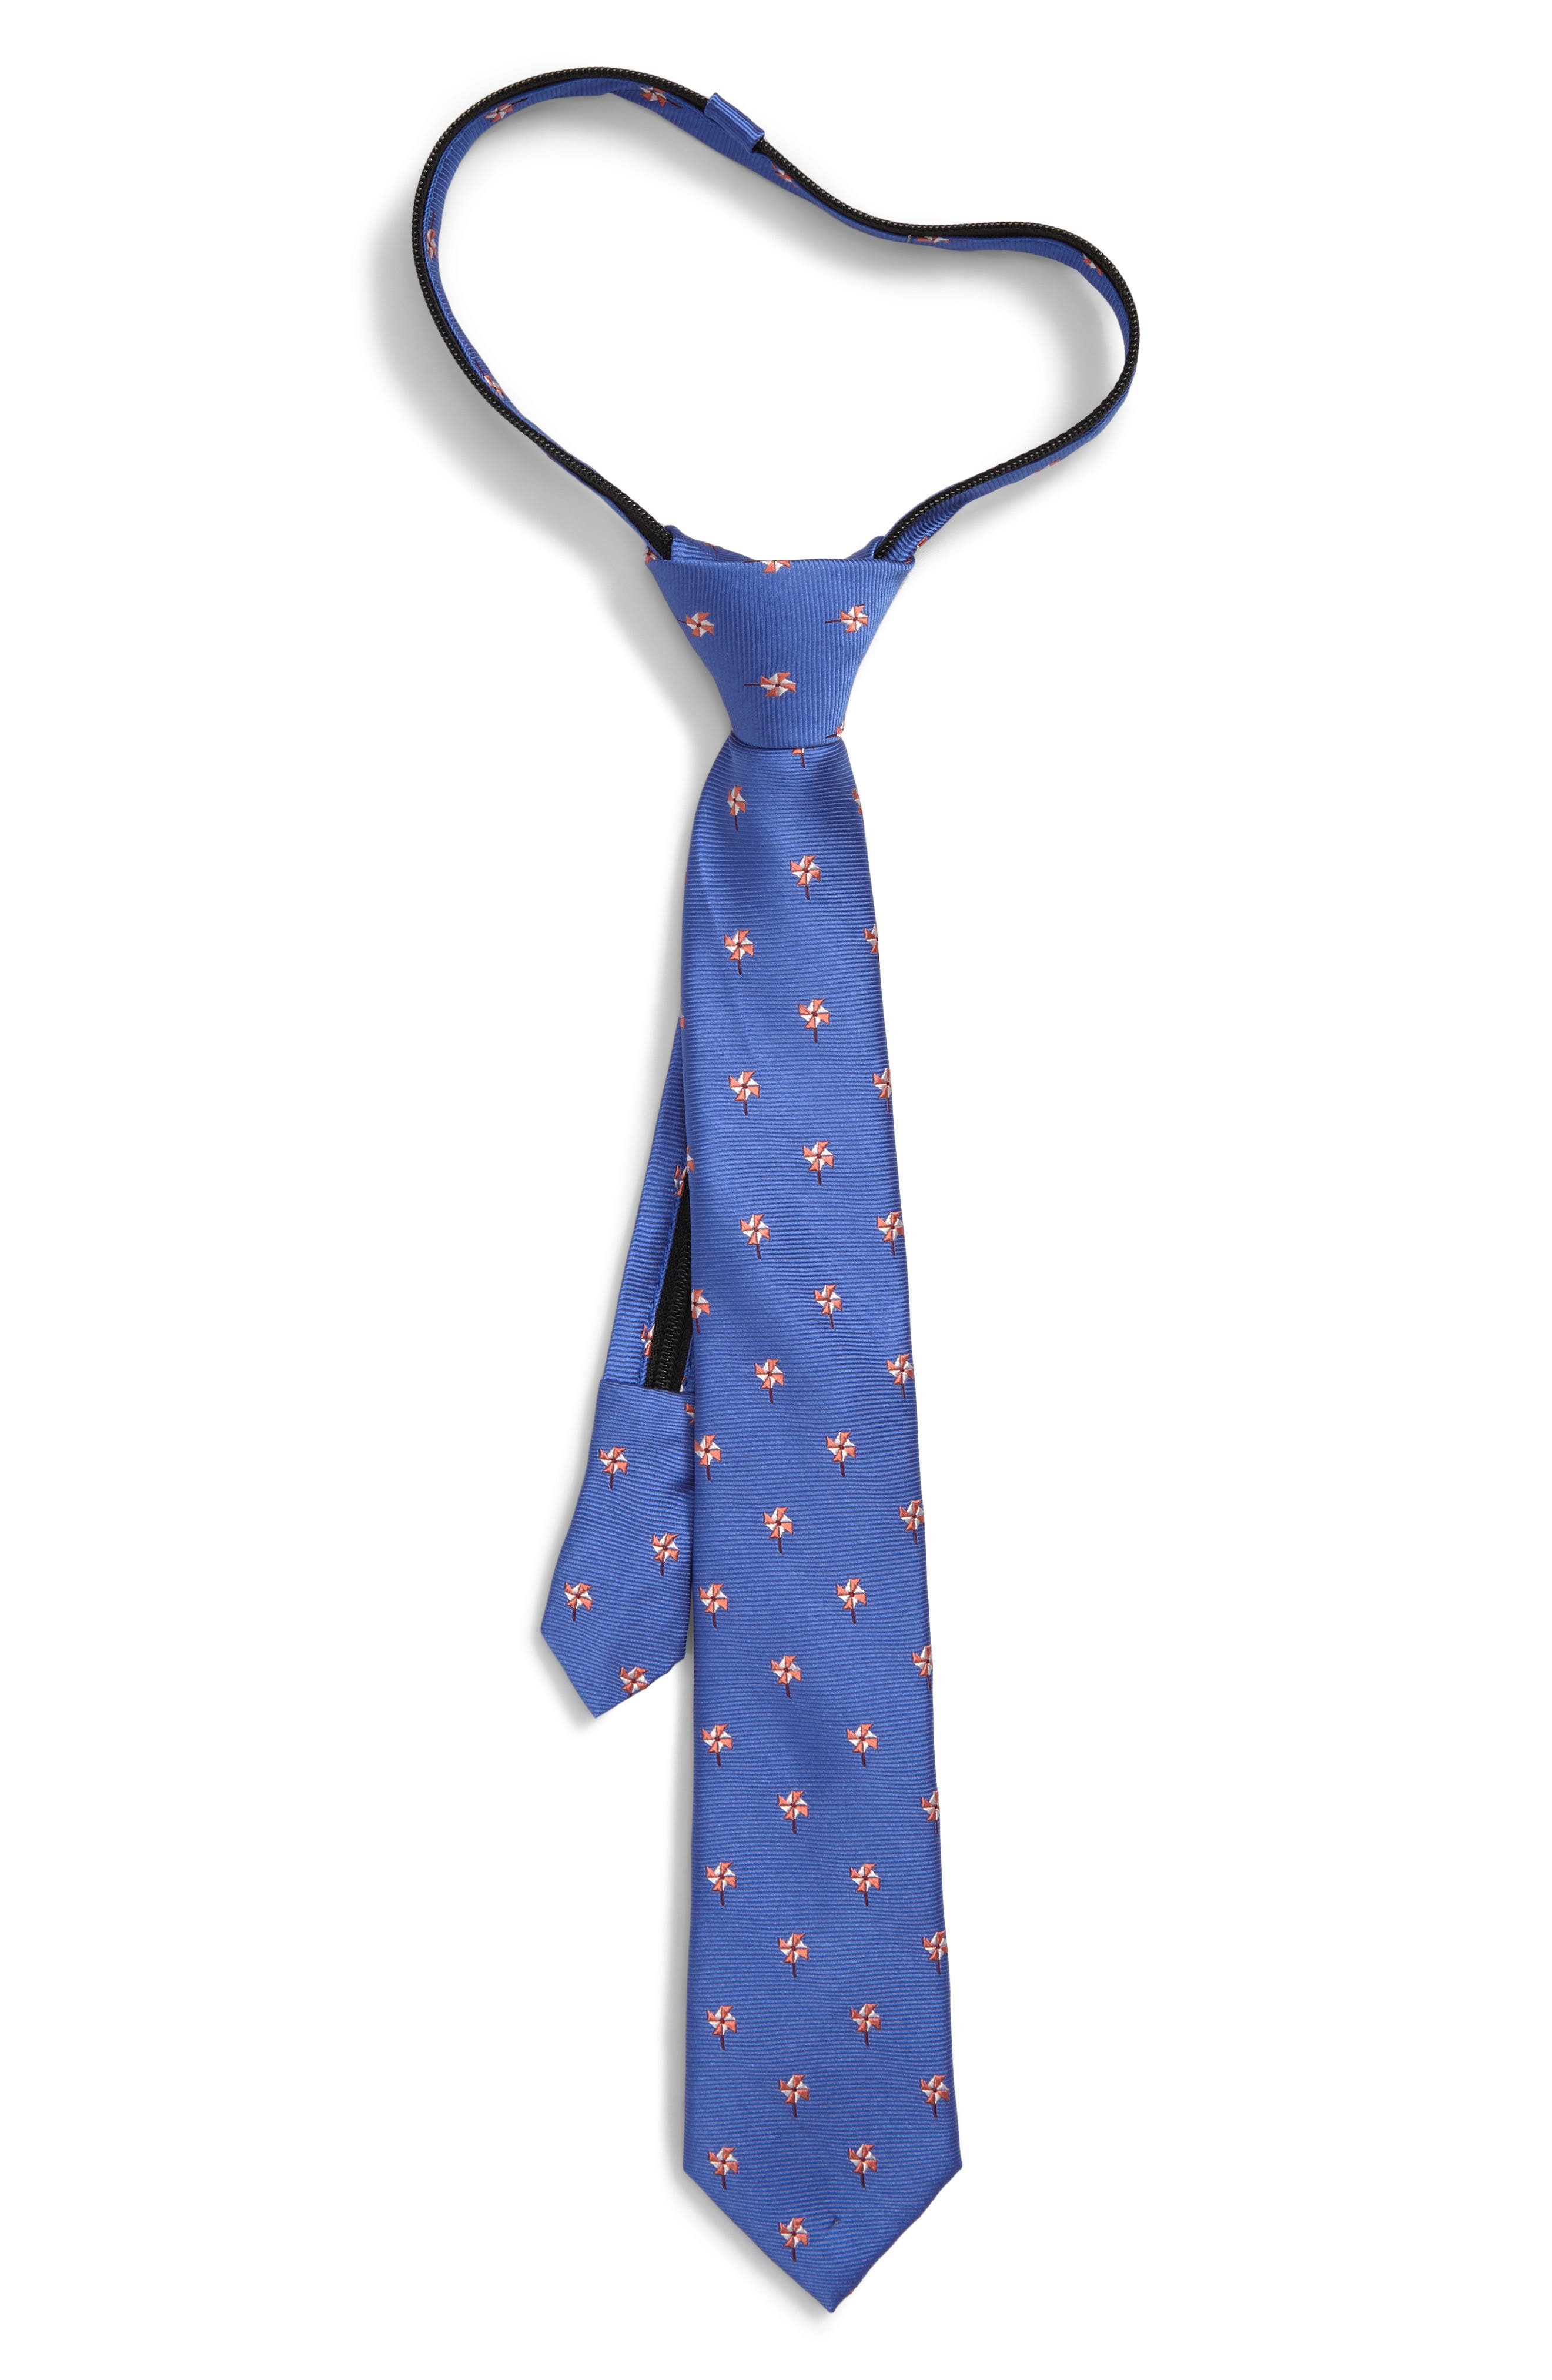 NORDSTROM, Jacob Solid Silk Zipper Tie, Main thumbnail 1, color, BLUE